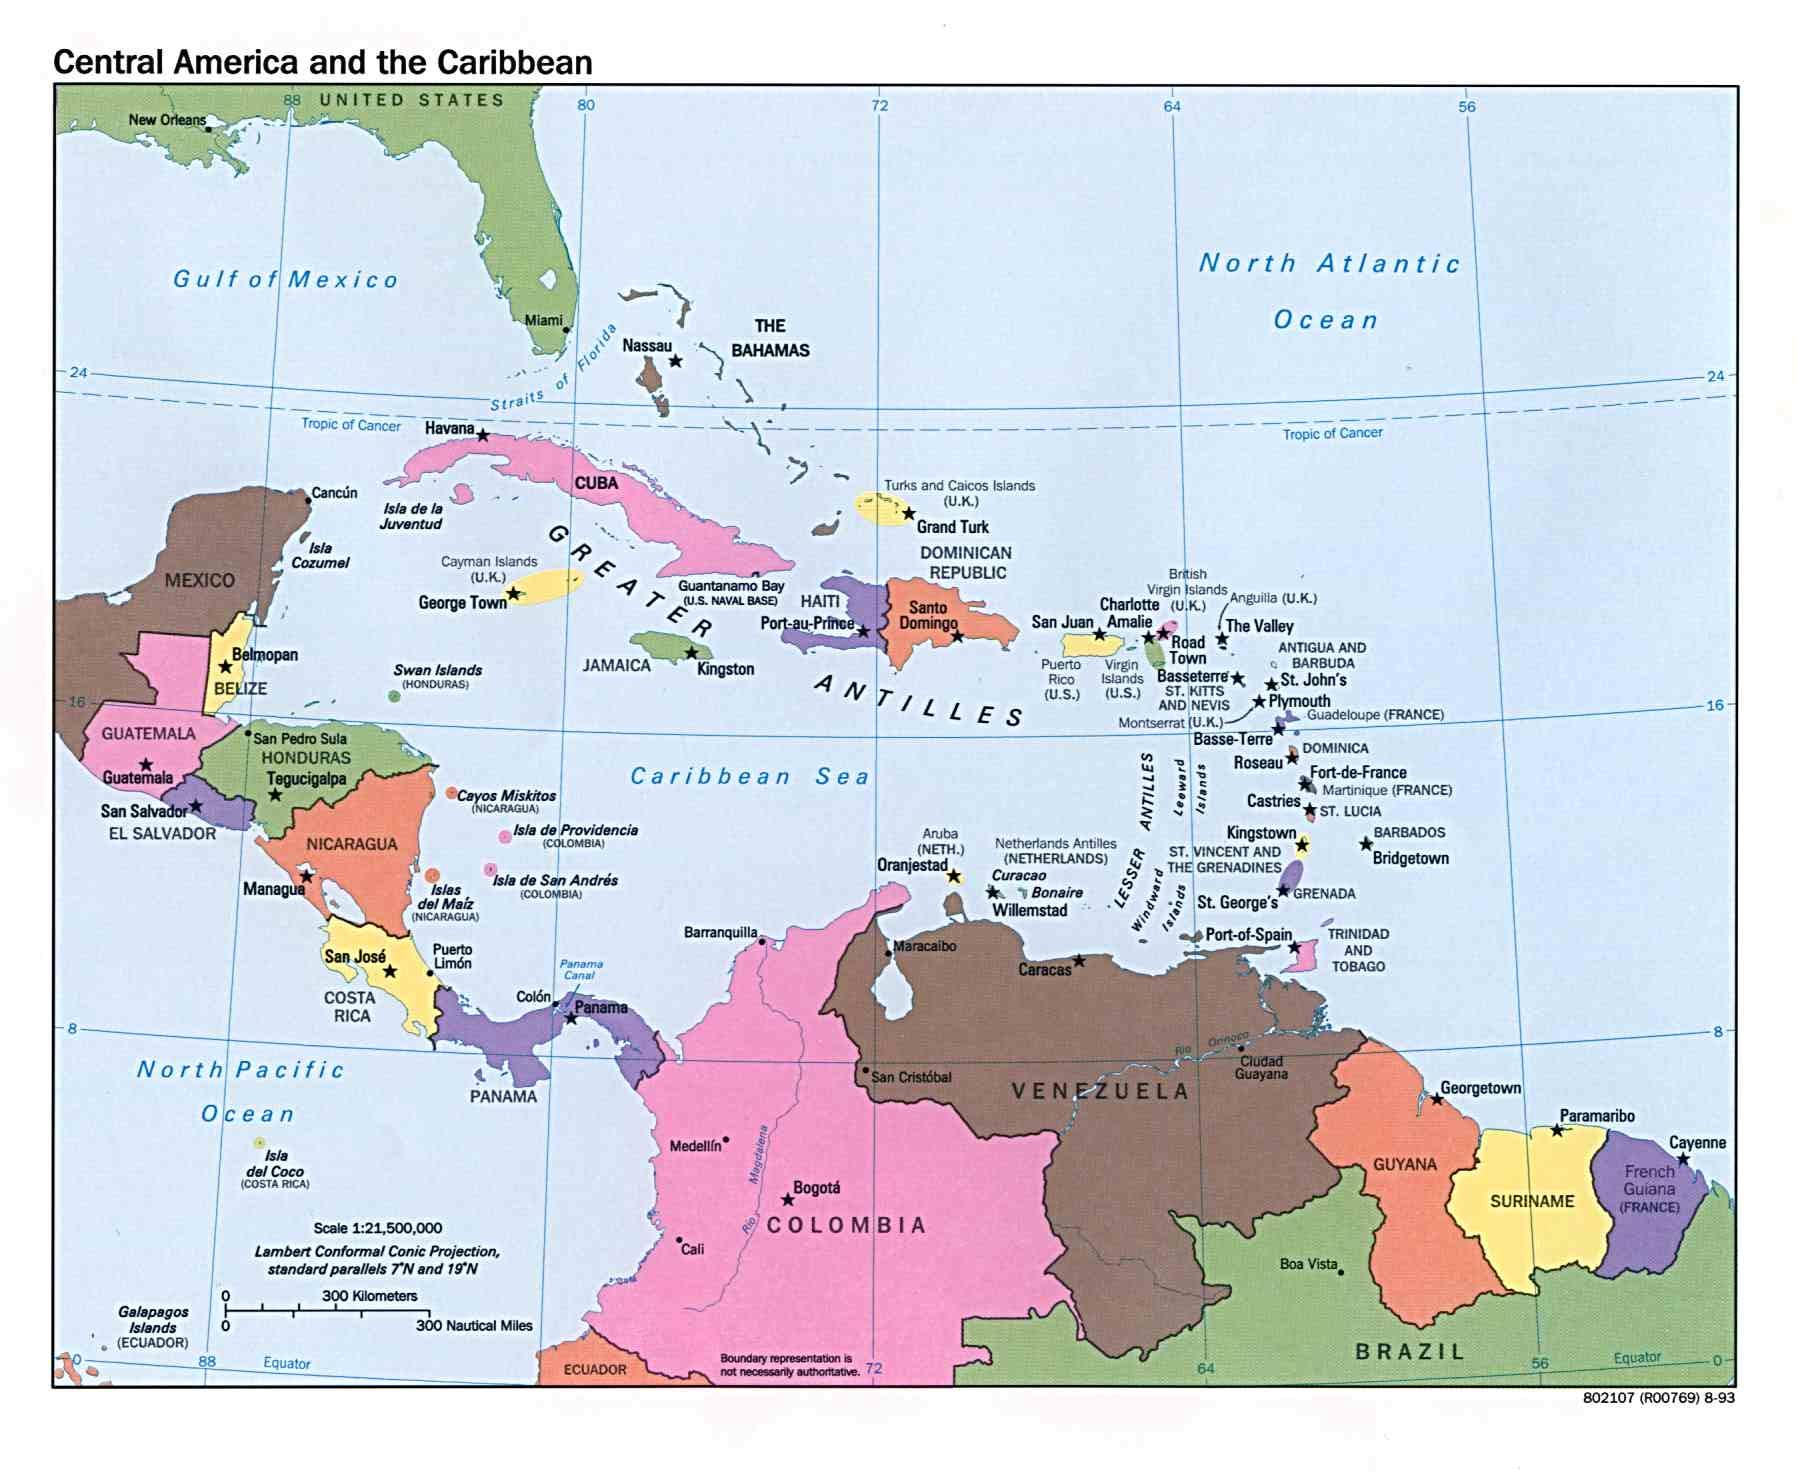 Honduras Kartica Kartica Hondurasa Srednja Amerika Juzna Amerika